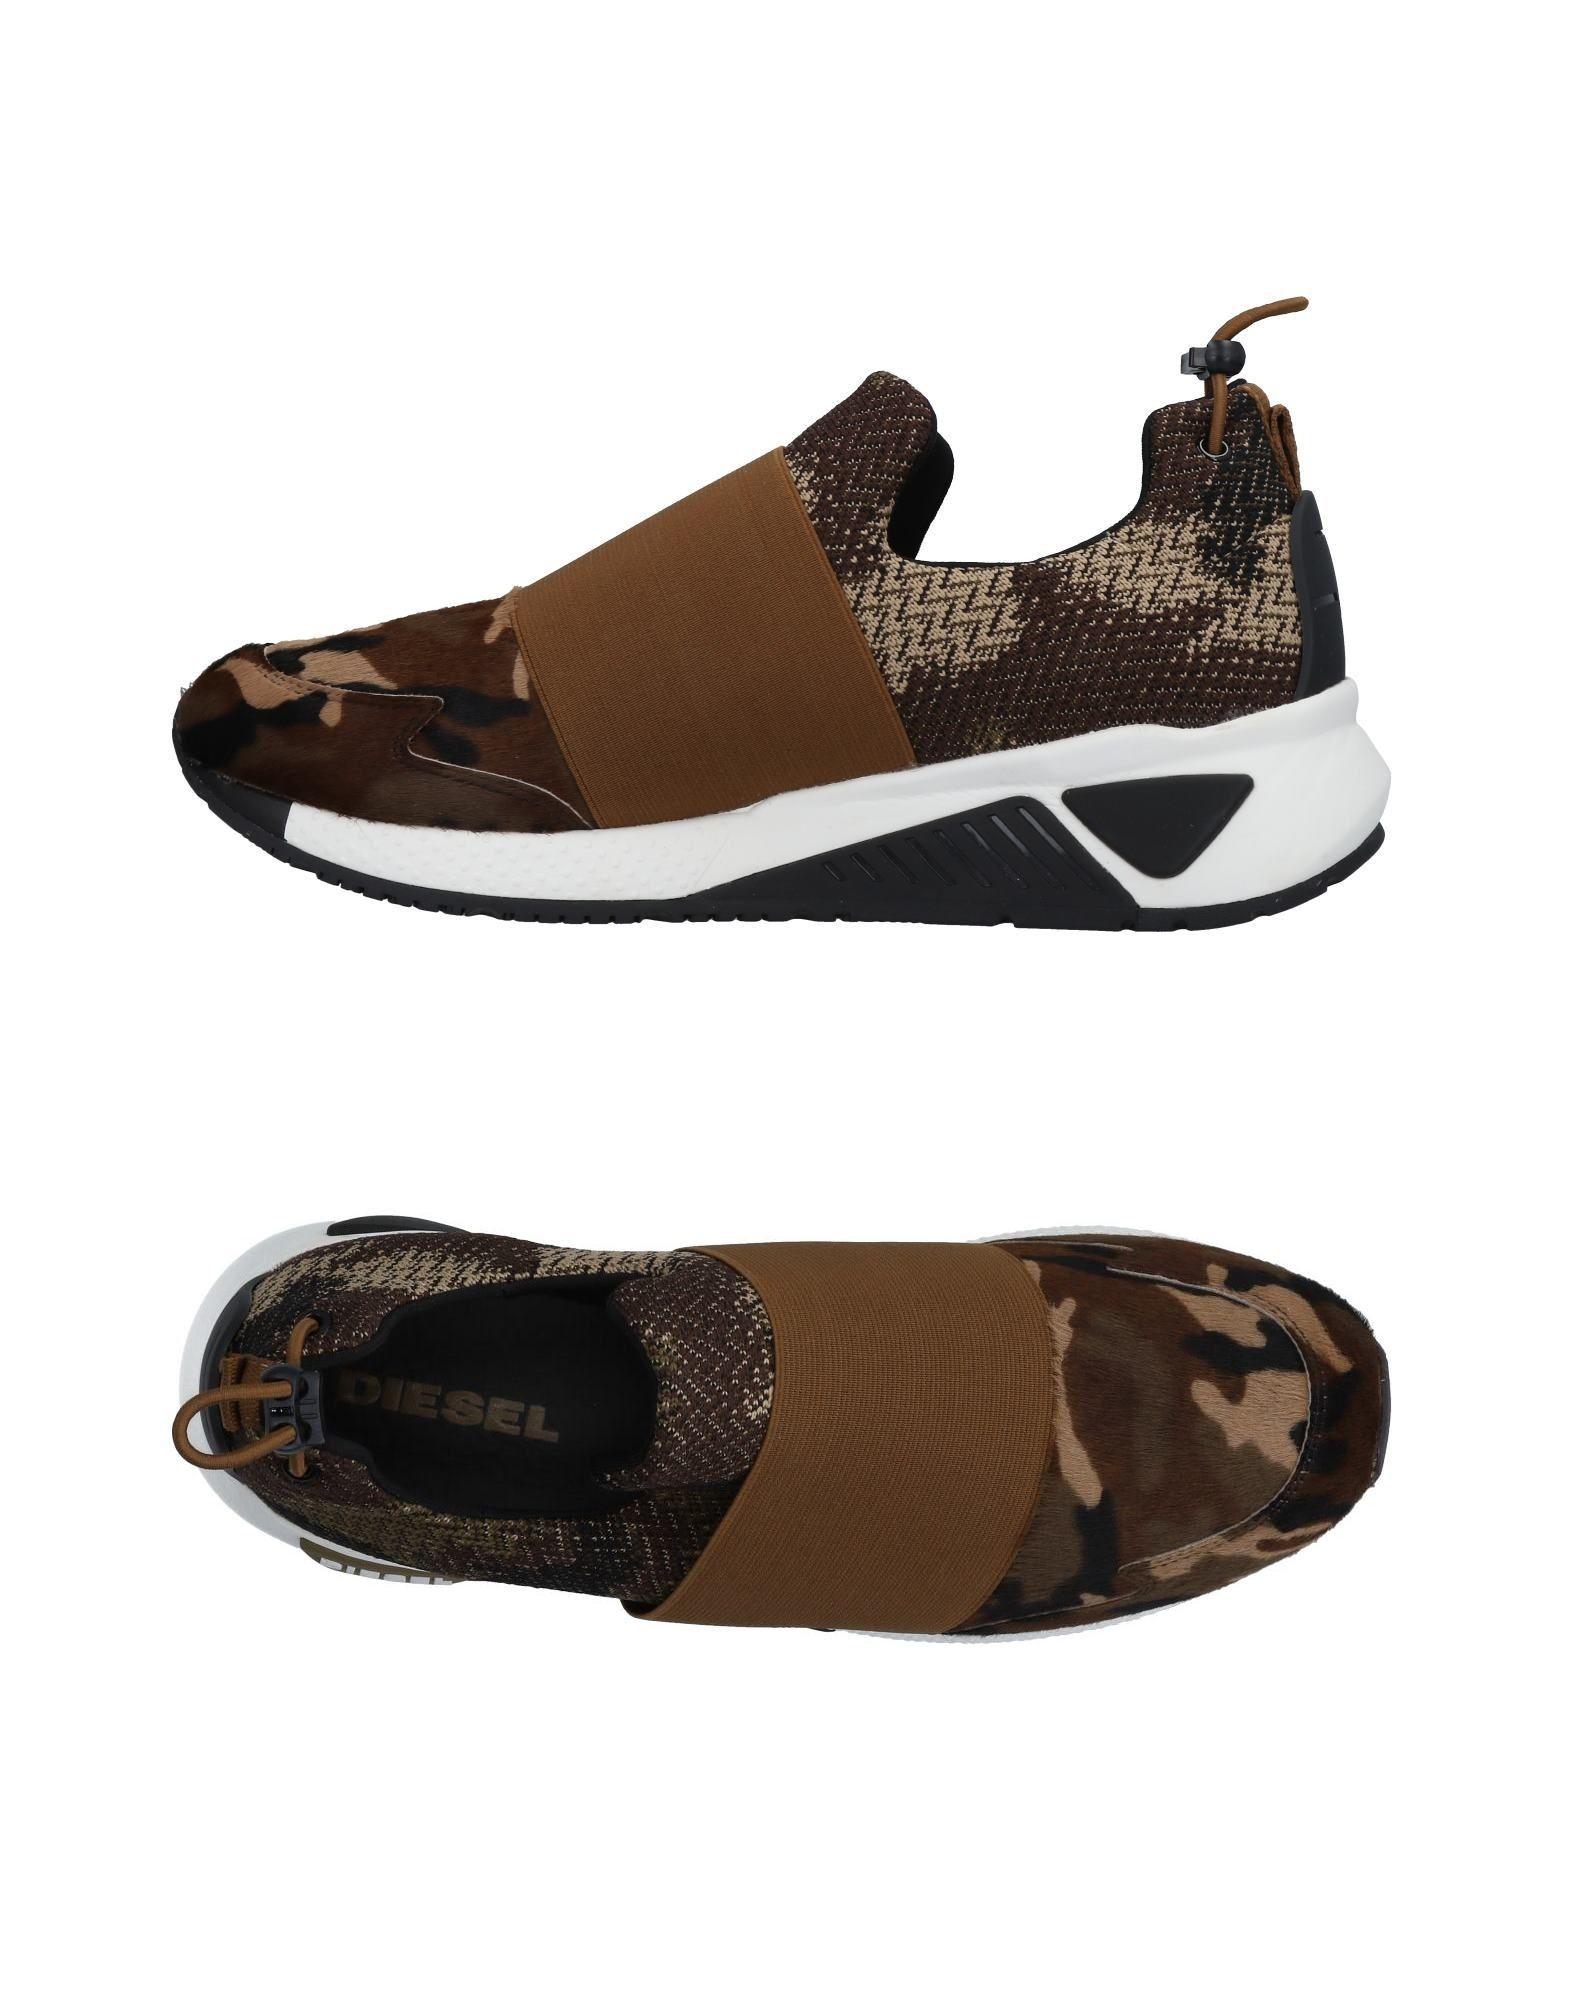 Moda Sneakers Diesel Uomo - 11476659QC